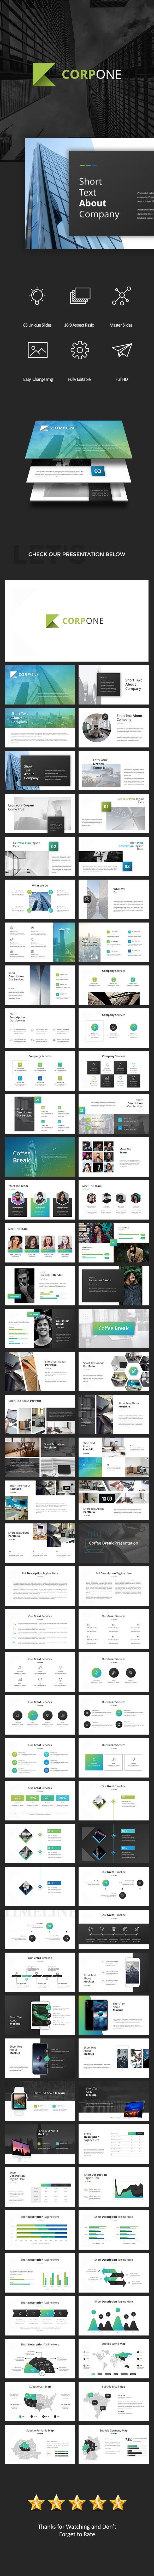 CorpOne Google Slides | Presentation templates, Template and Keynote